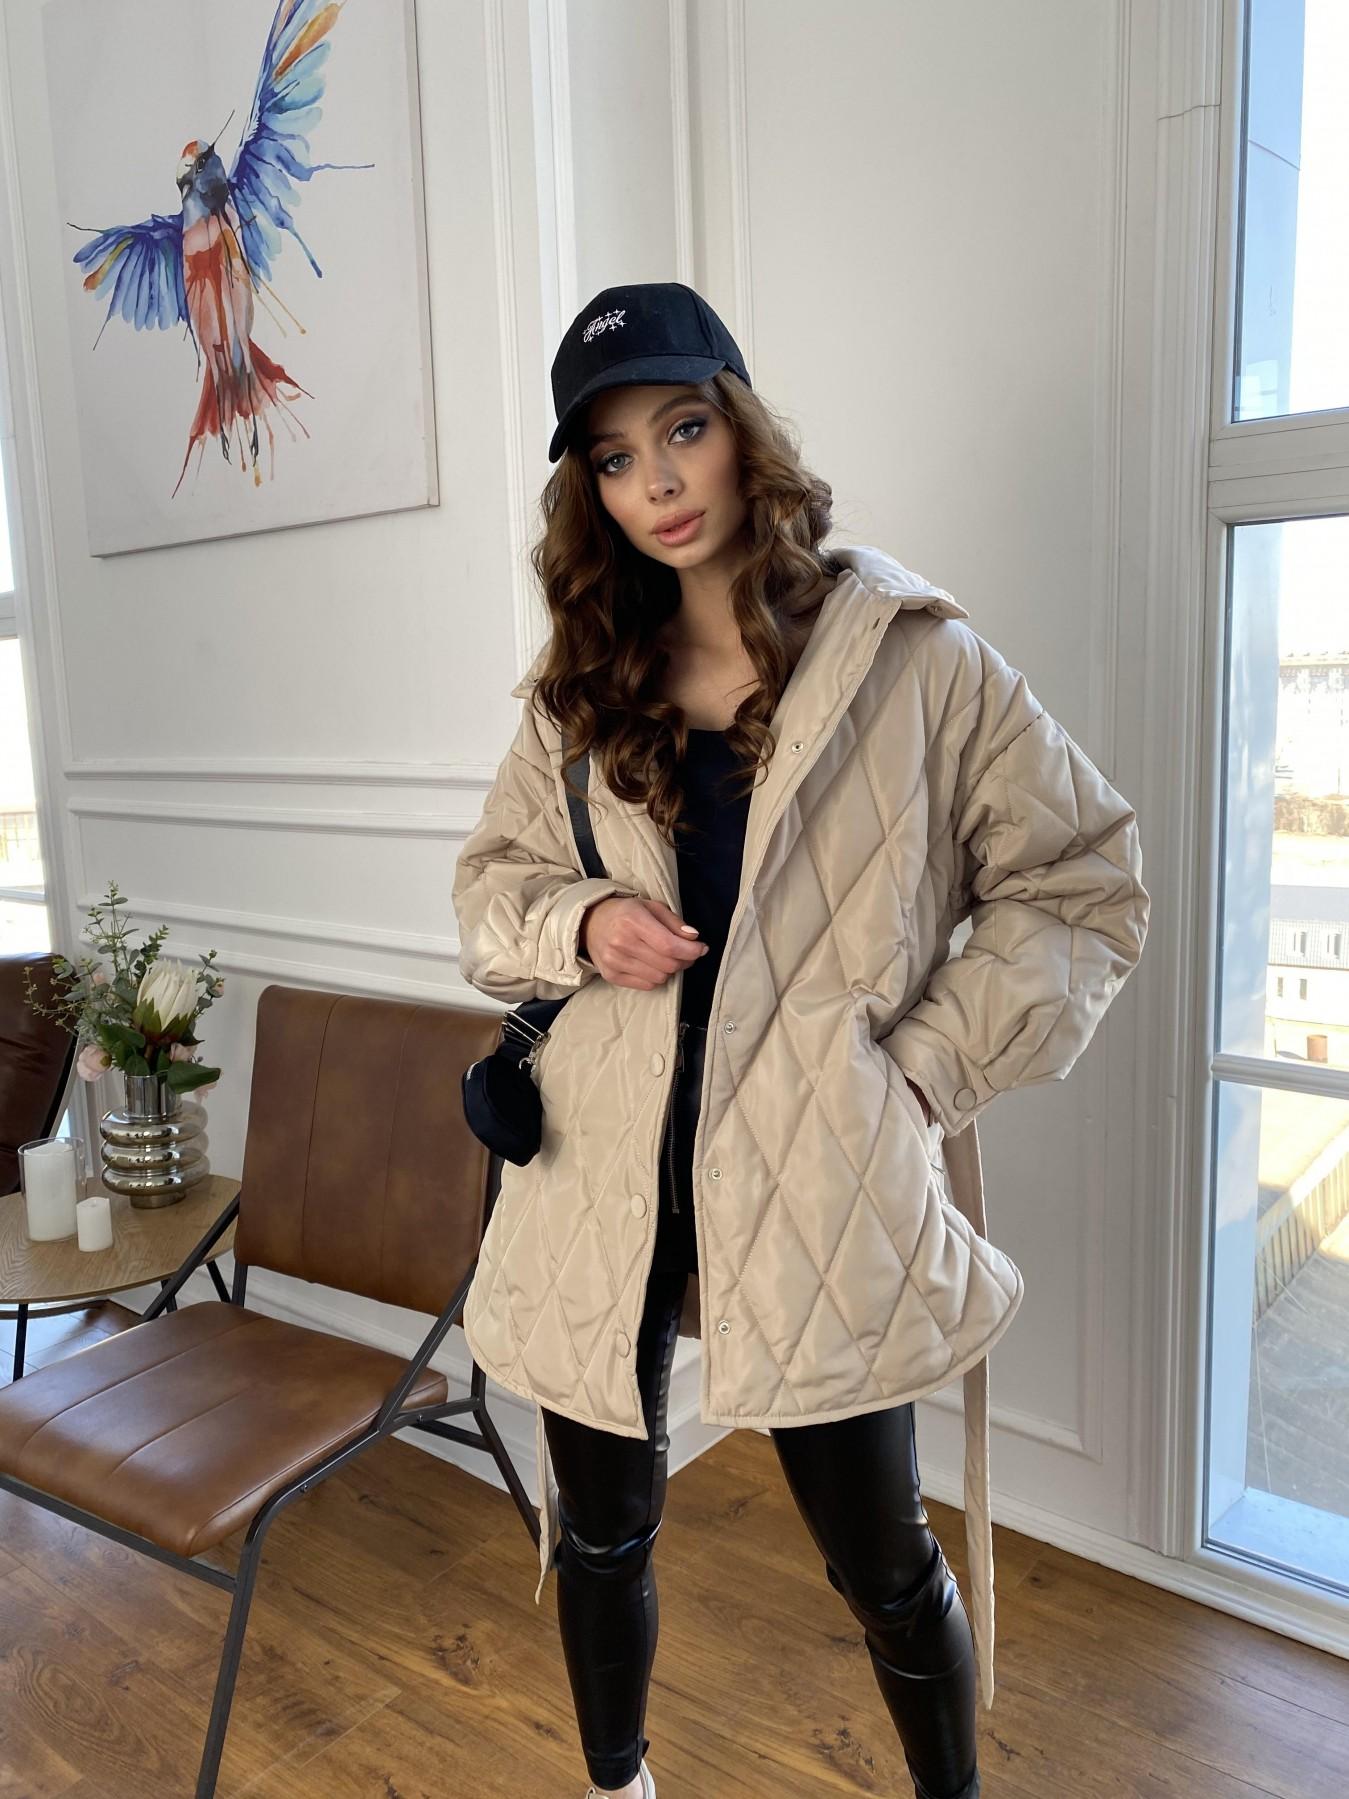 Пазл стеганая куртка из плащевки 10890 АРТ. 47449 Цвет: Бежевый - фото 3, интернет магазин tm-modus.ru